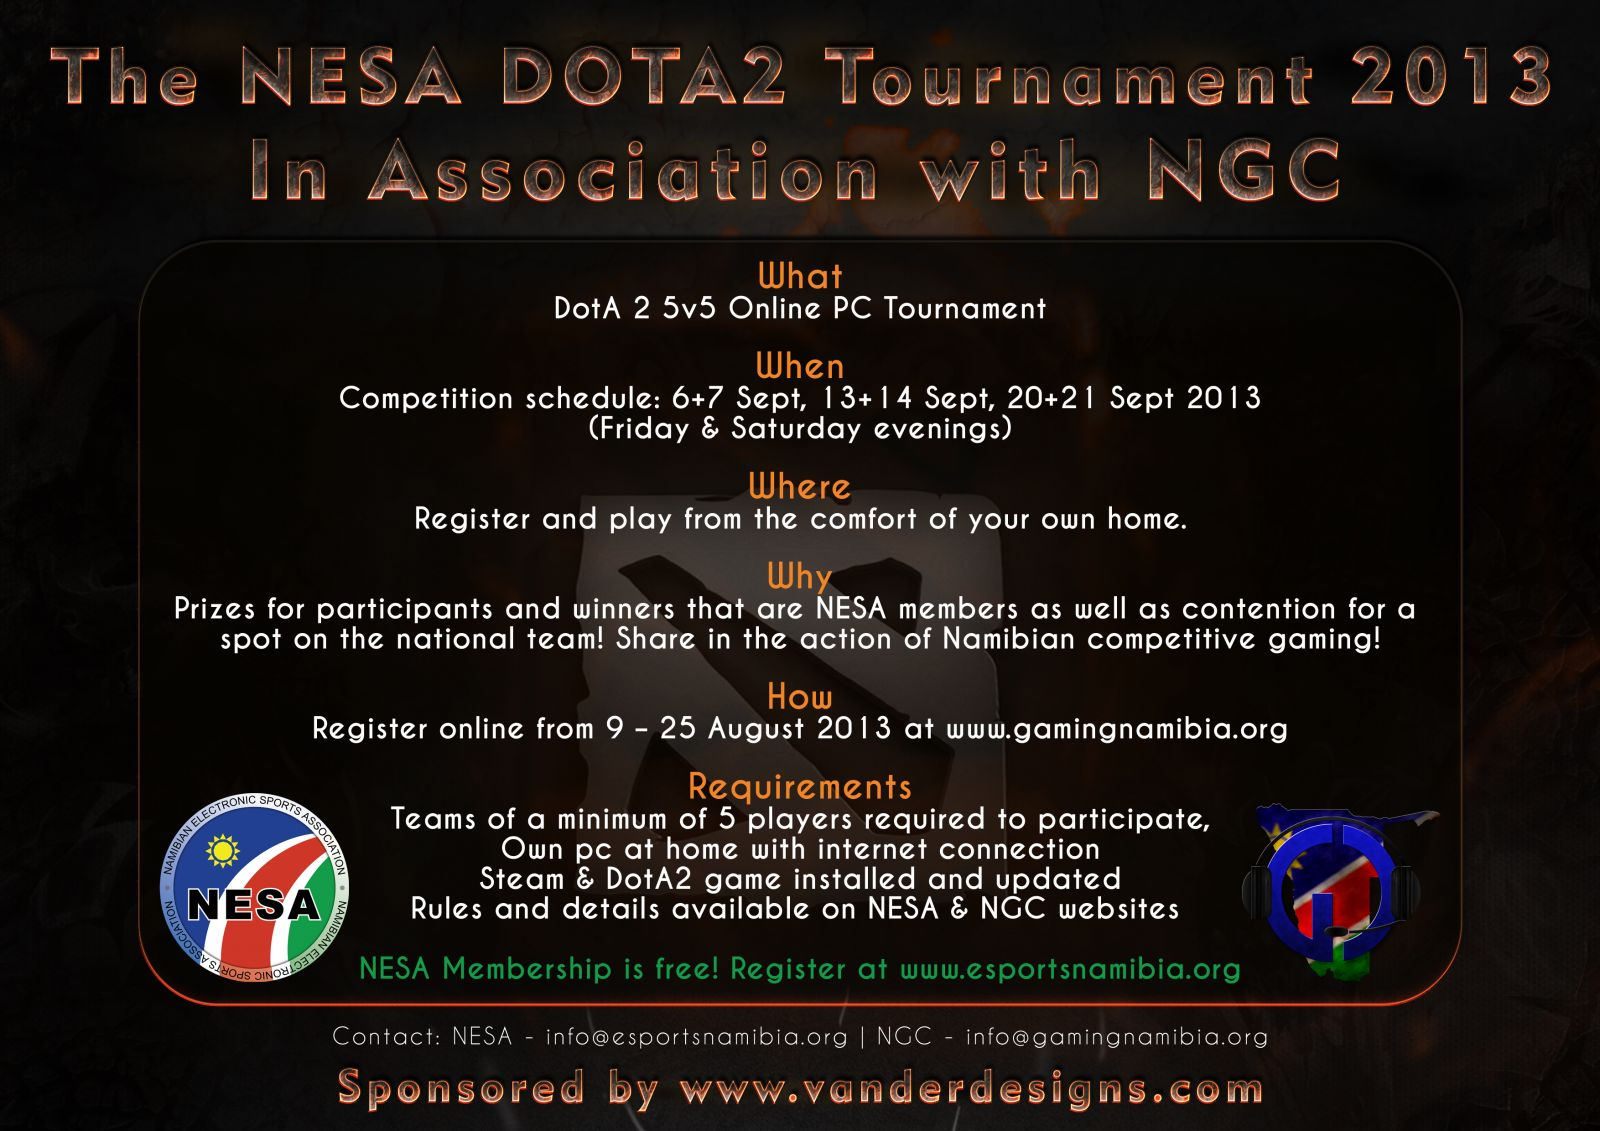 the nesa dota2 tournament advert 1 hwc handle with care clan